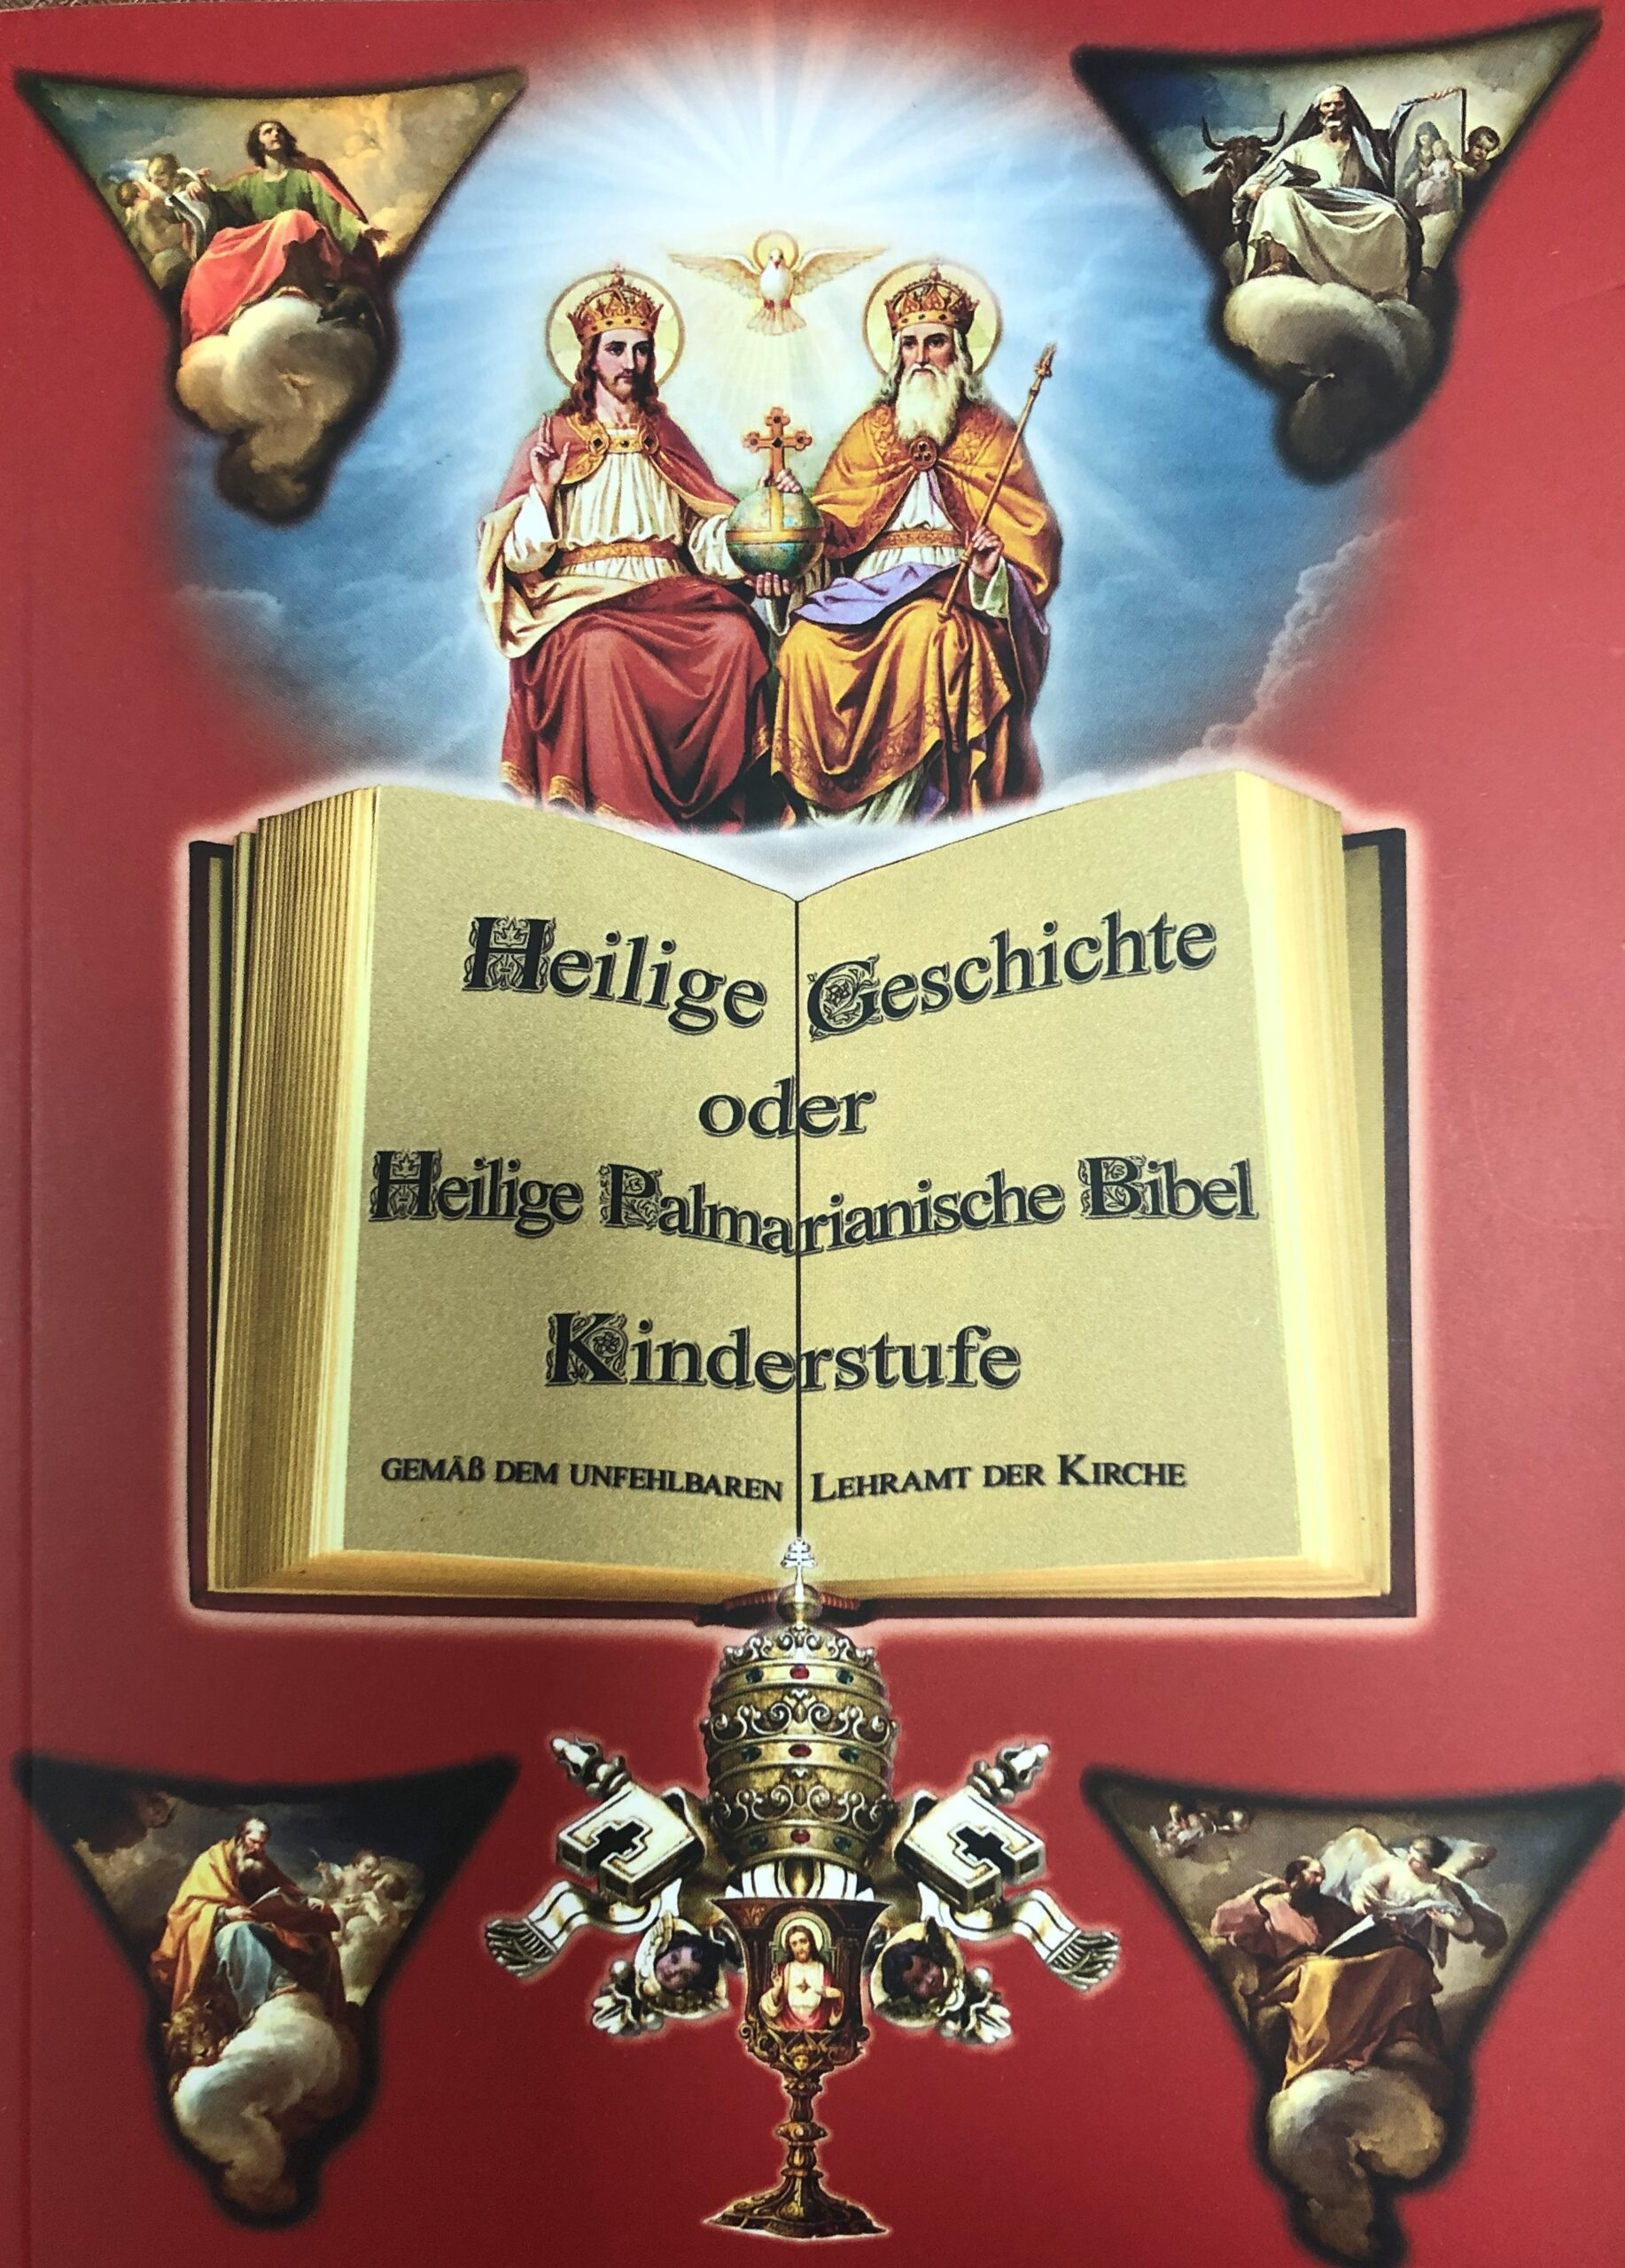 "<a href=""/wp-content/uploads/2020/11/Biblia-Infantil-ALE.pdf"" title=""Heilige Geschichte oder Heilige Palmarianische Bibel Kinderstufe>Heilige Geschichte oder Heilige Palmarianische Bibel Kinderstufe <br><br>Mehr</a>"